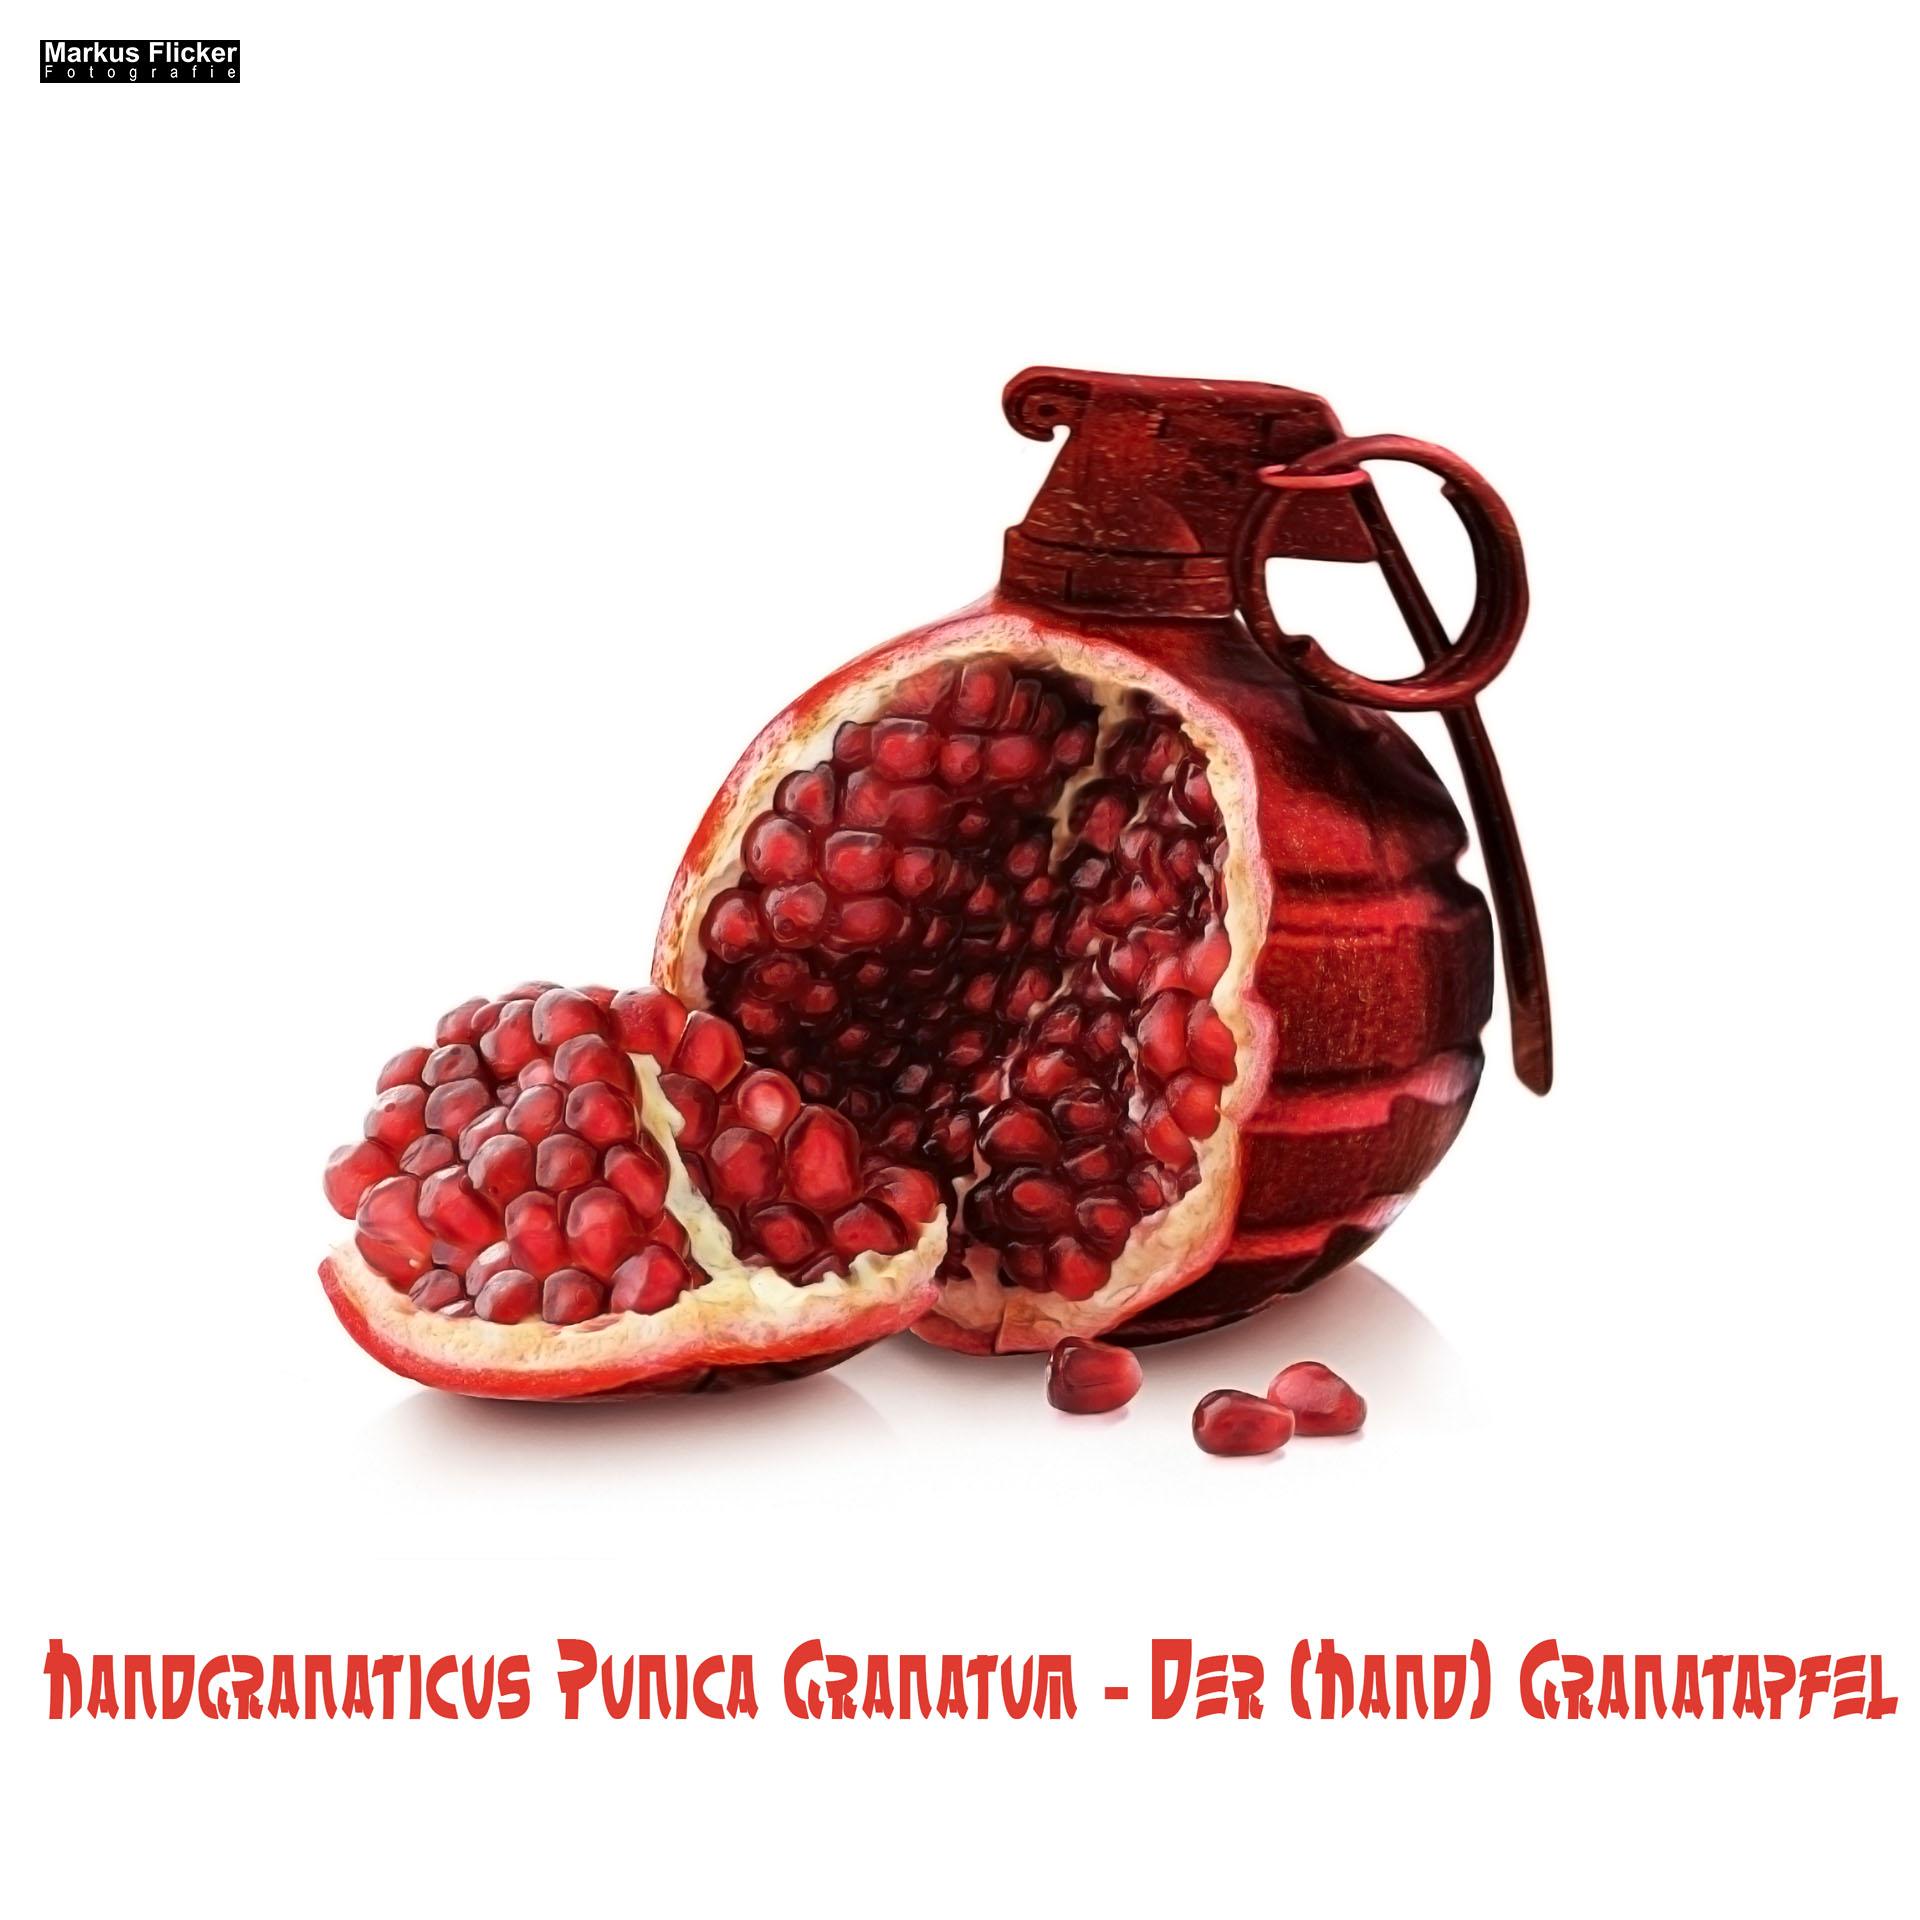 Handgranaticus Punica Granatum -- Der (Hand) Granatapfel - Photoshop Compositing #markusflicker